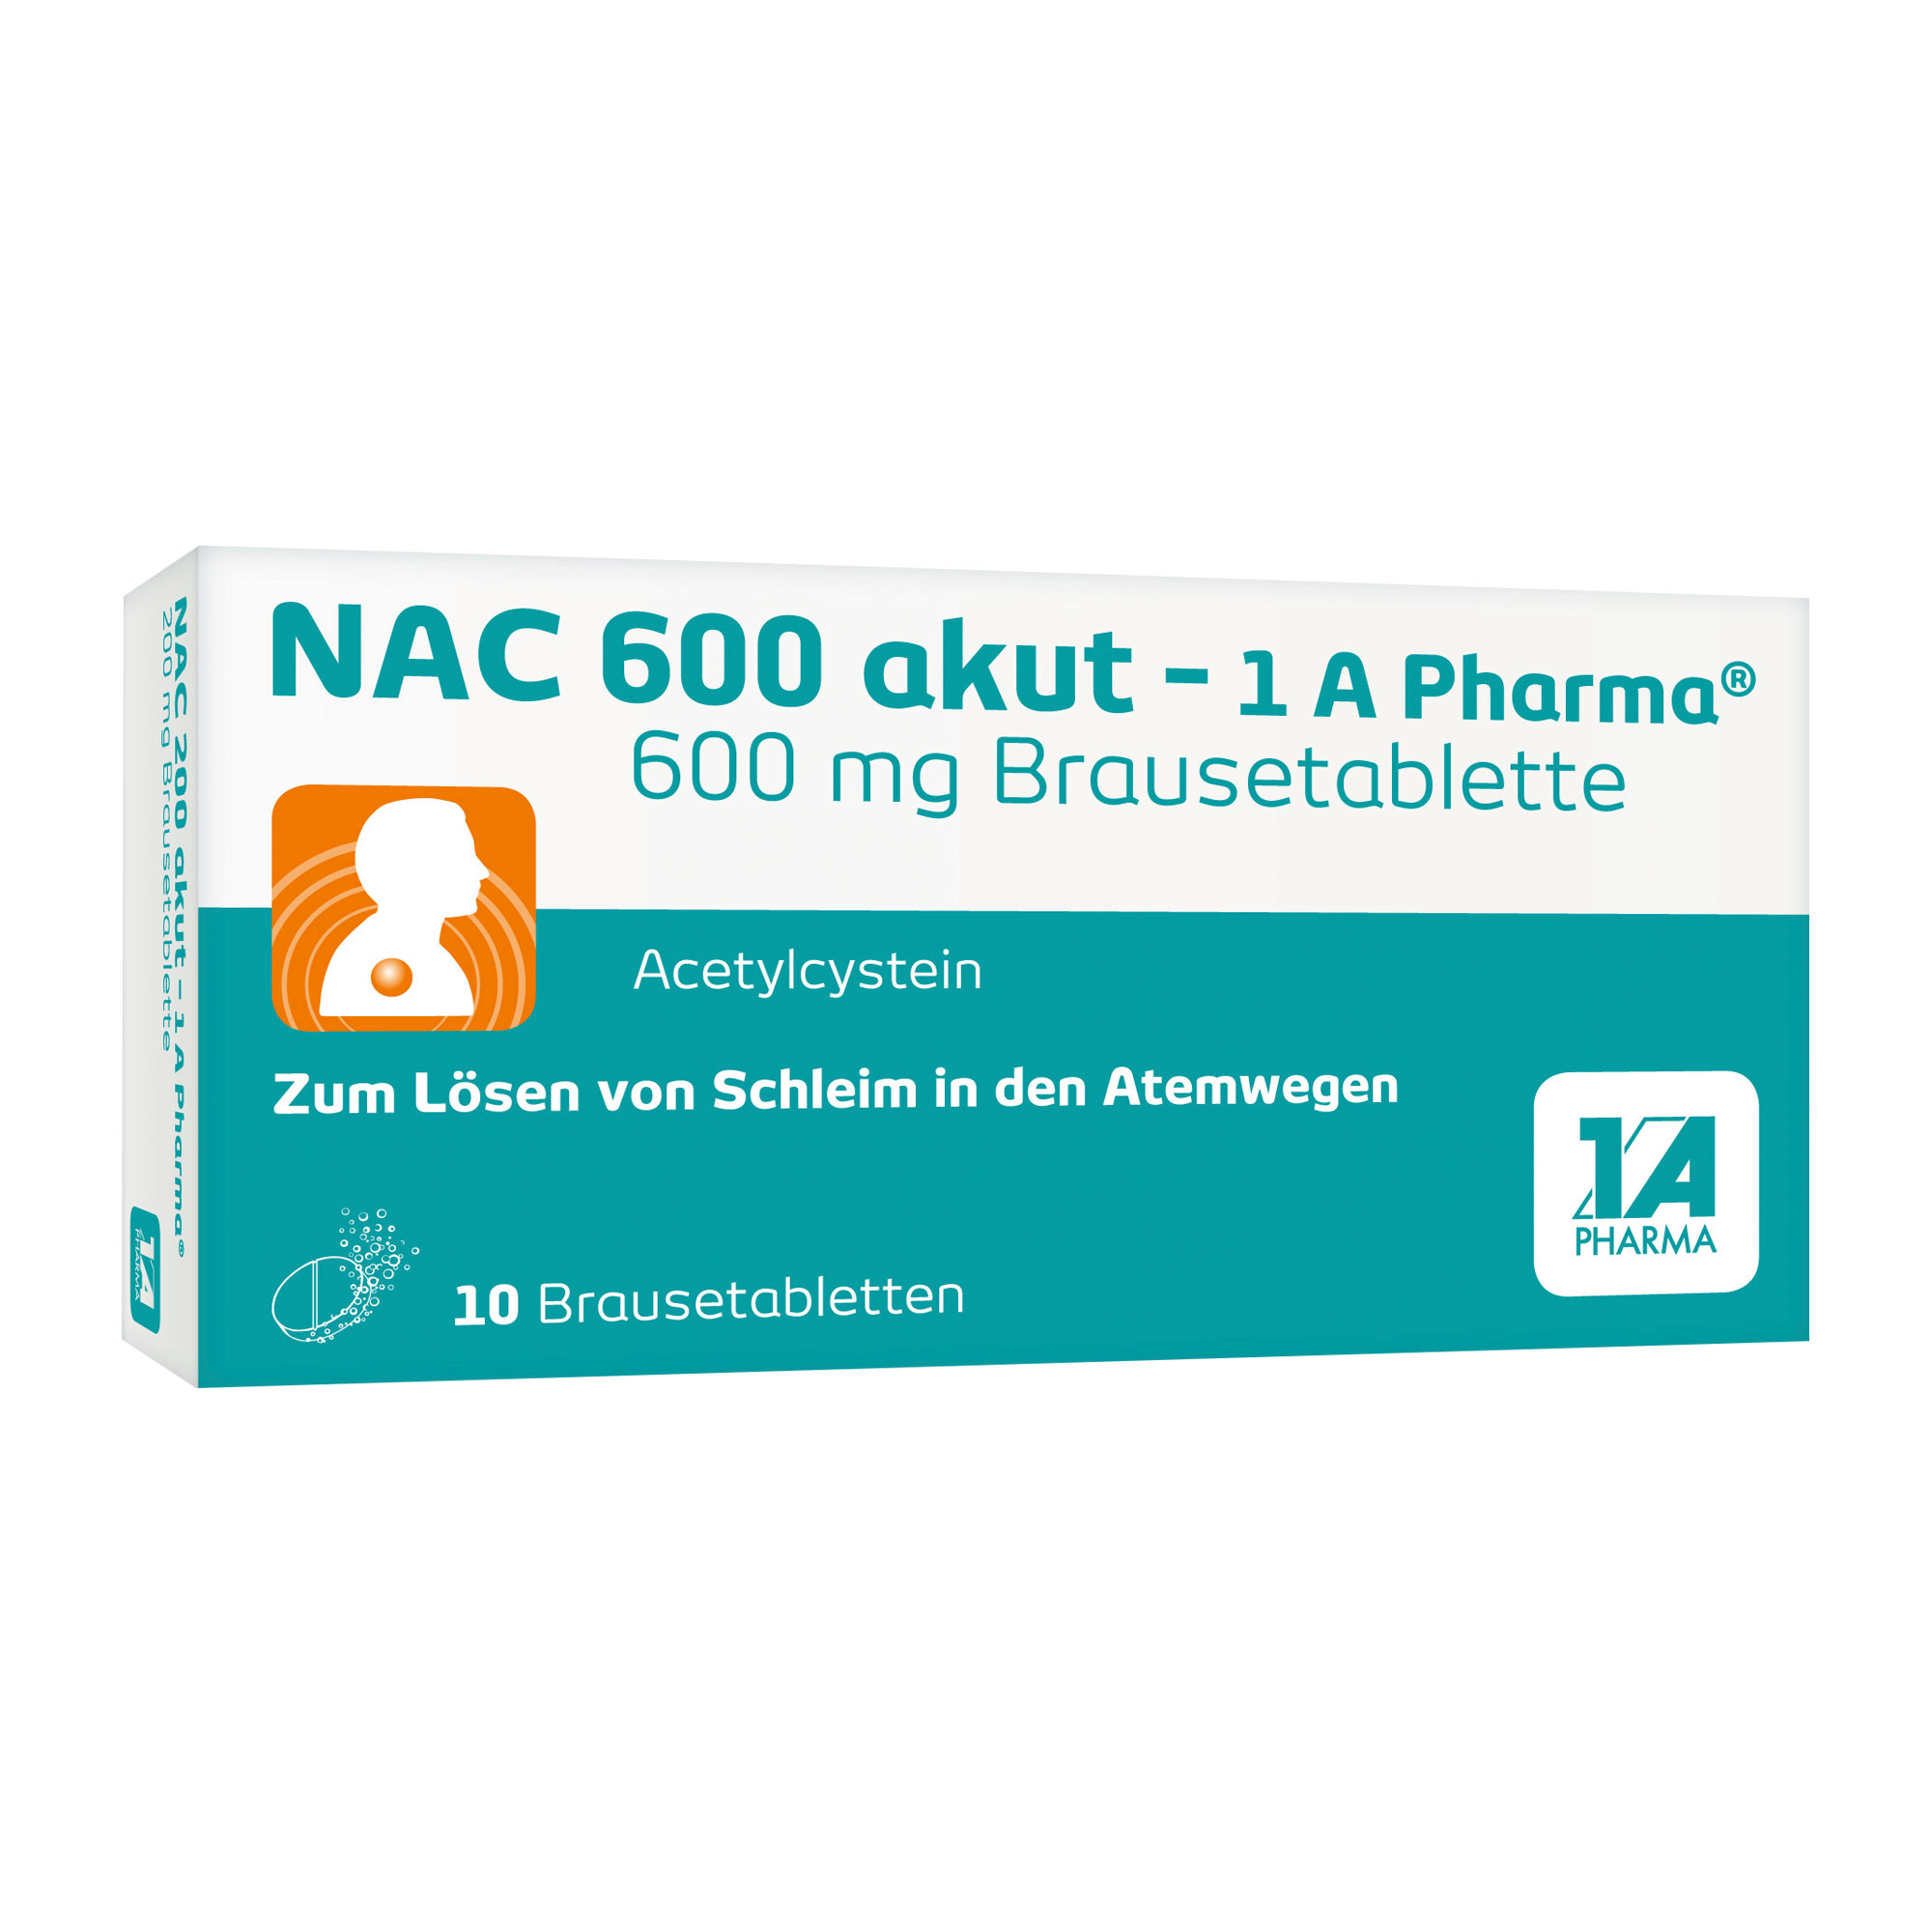 Nac 600 akut - 1 A Pharma Brausetabletten